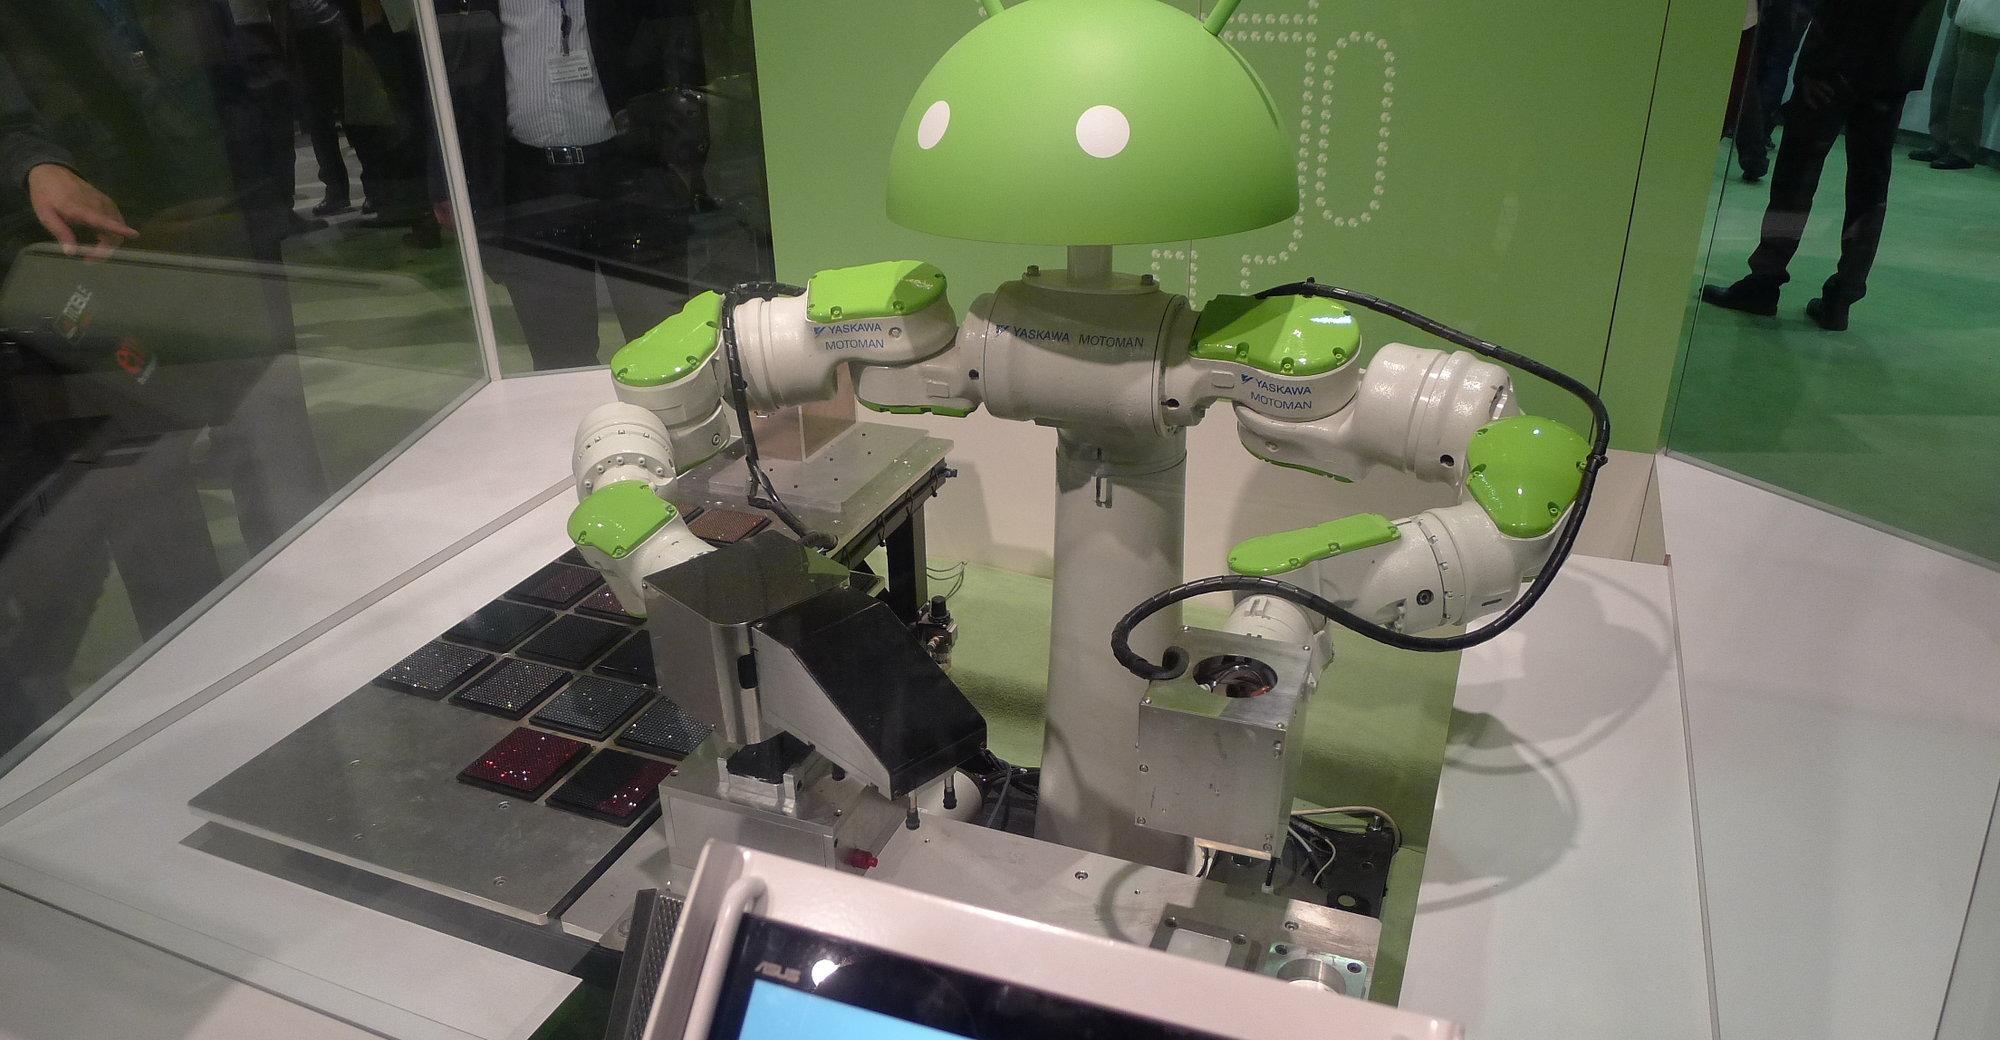 Android-roboten dekorerte deksler.